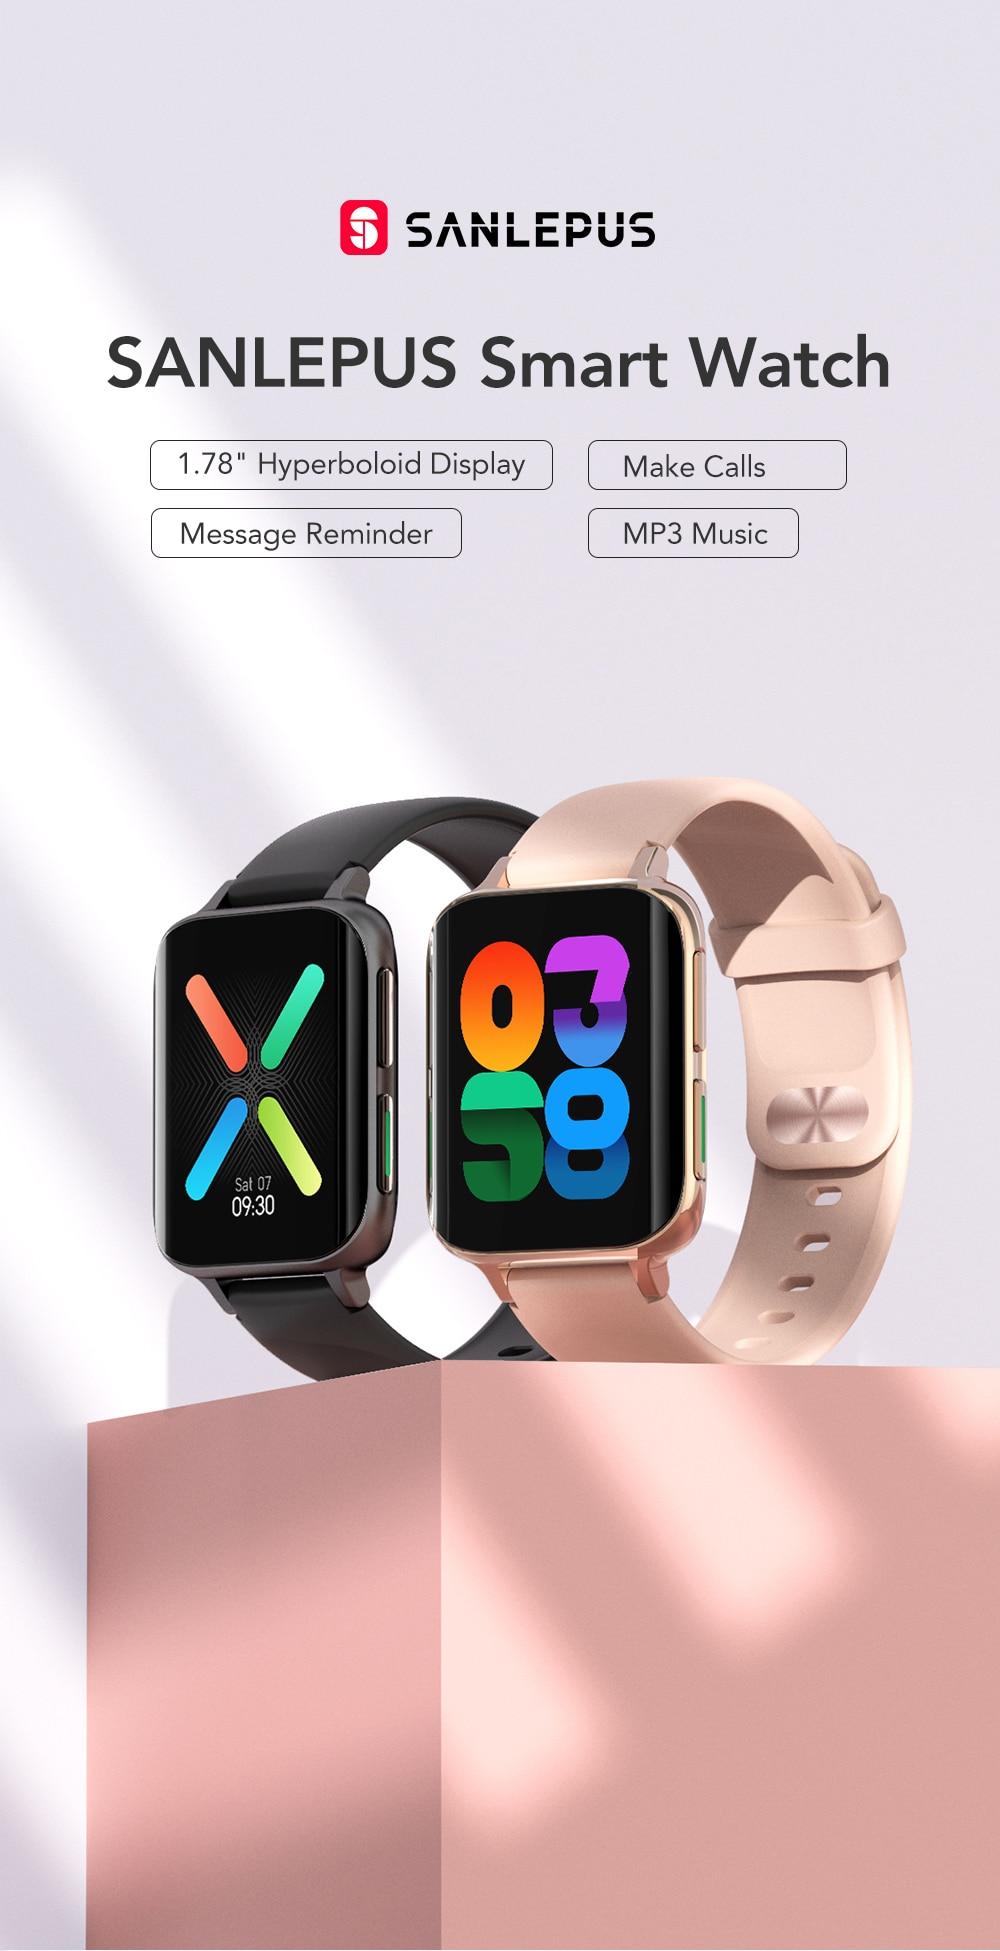 H30ee93e999964f5da7524b399cdea092Z SANLEPUS 2021 New Smart Watch Men Women Dial Call Watch Waterproof Smartwatch MP3 Player For OPPO Android Apple Xiaomi